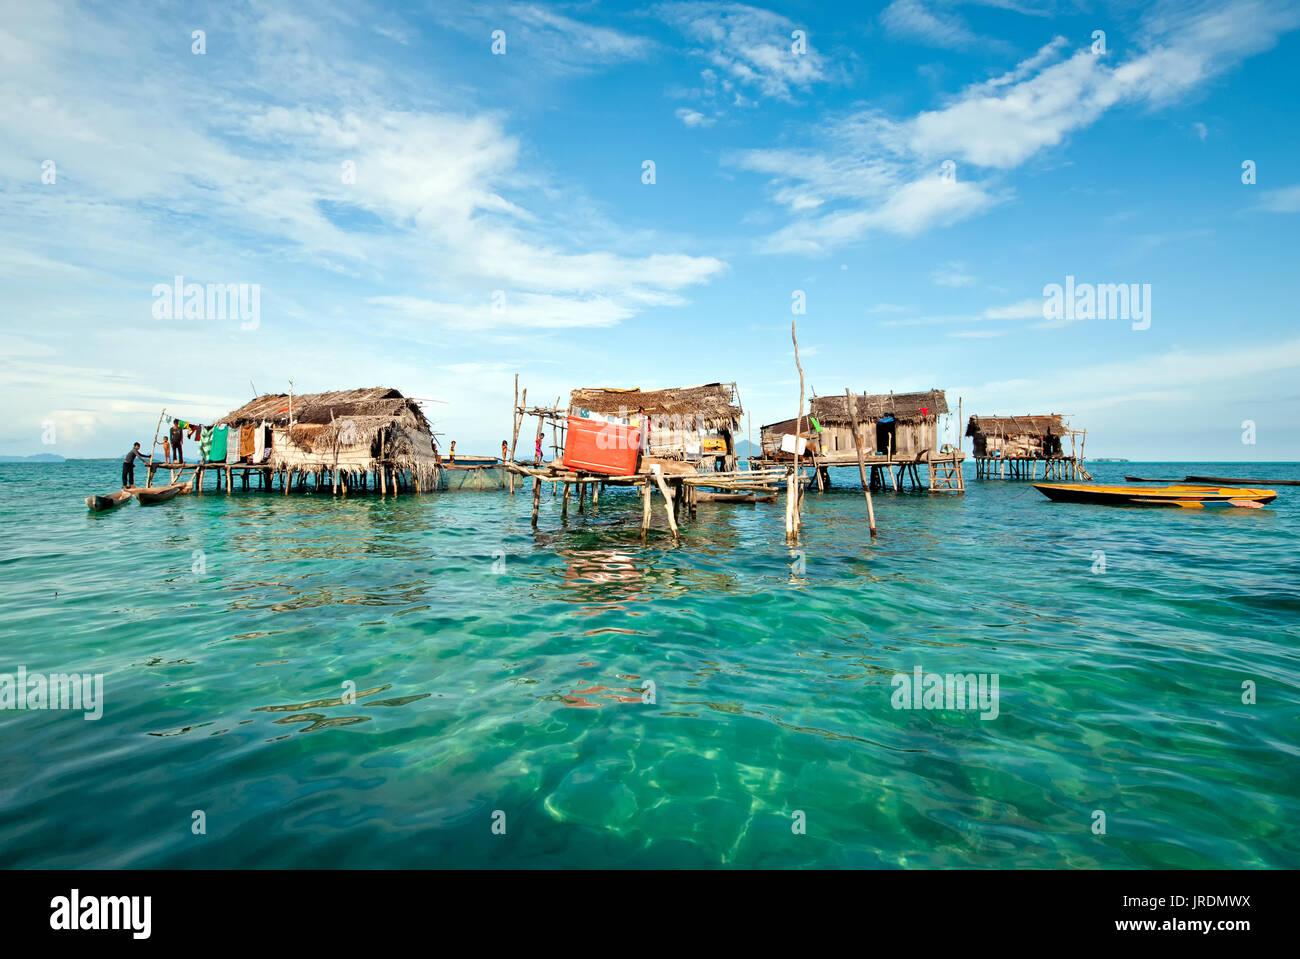 Semporna , Malaysia: September 17, 2011: Bajau Laut or sea nomadic people stilted houses at the village in Tun Sakaran Marine Park. - Stock Image